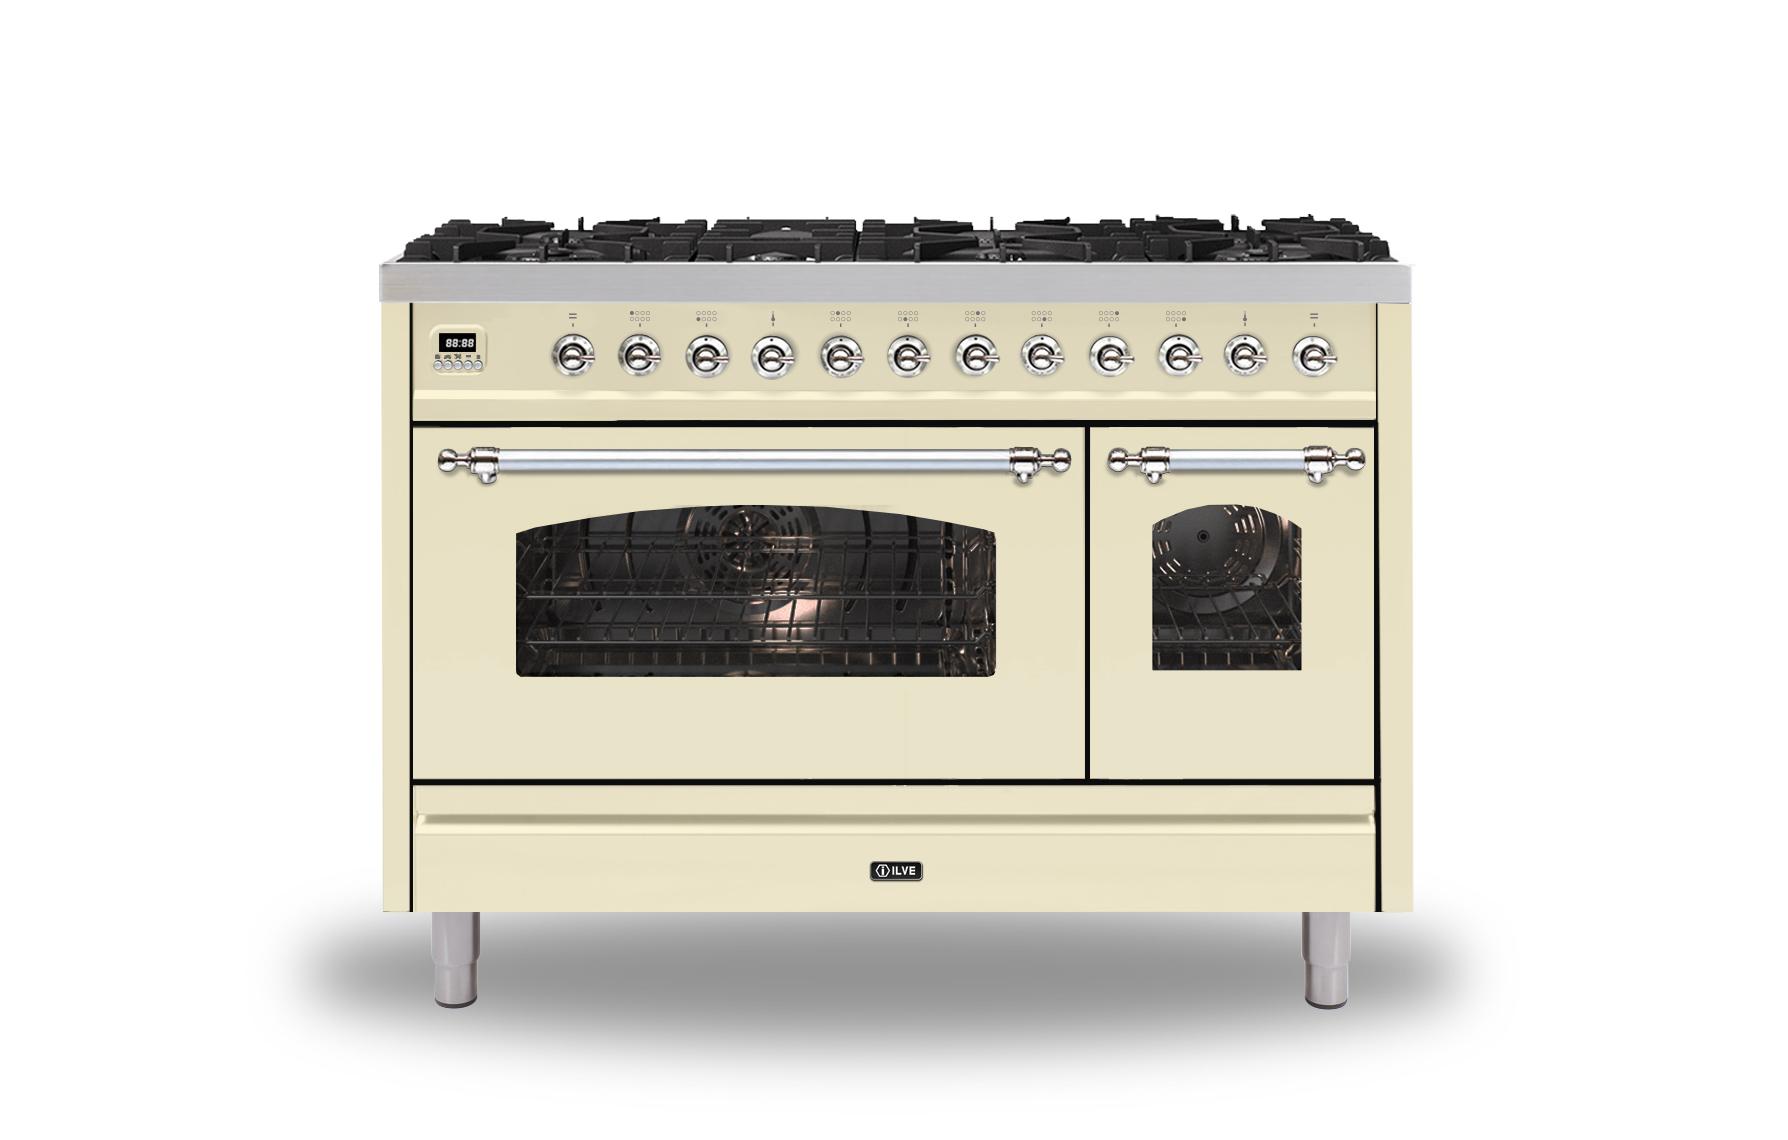 ILVE Milano P128NE3 120cm cooker 90cm + 30cm ovens and 8 gas burner top